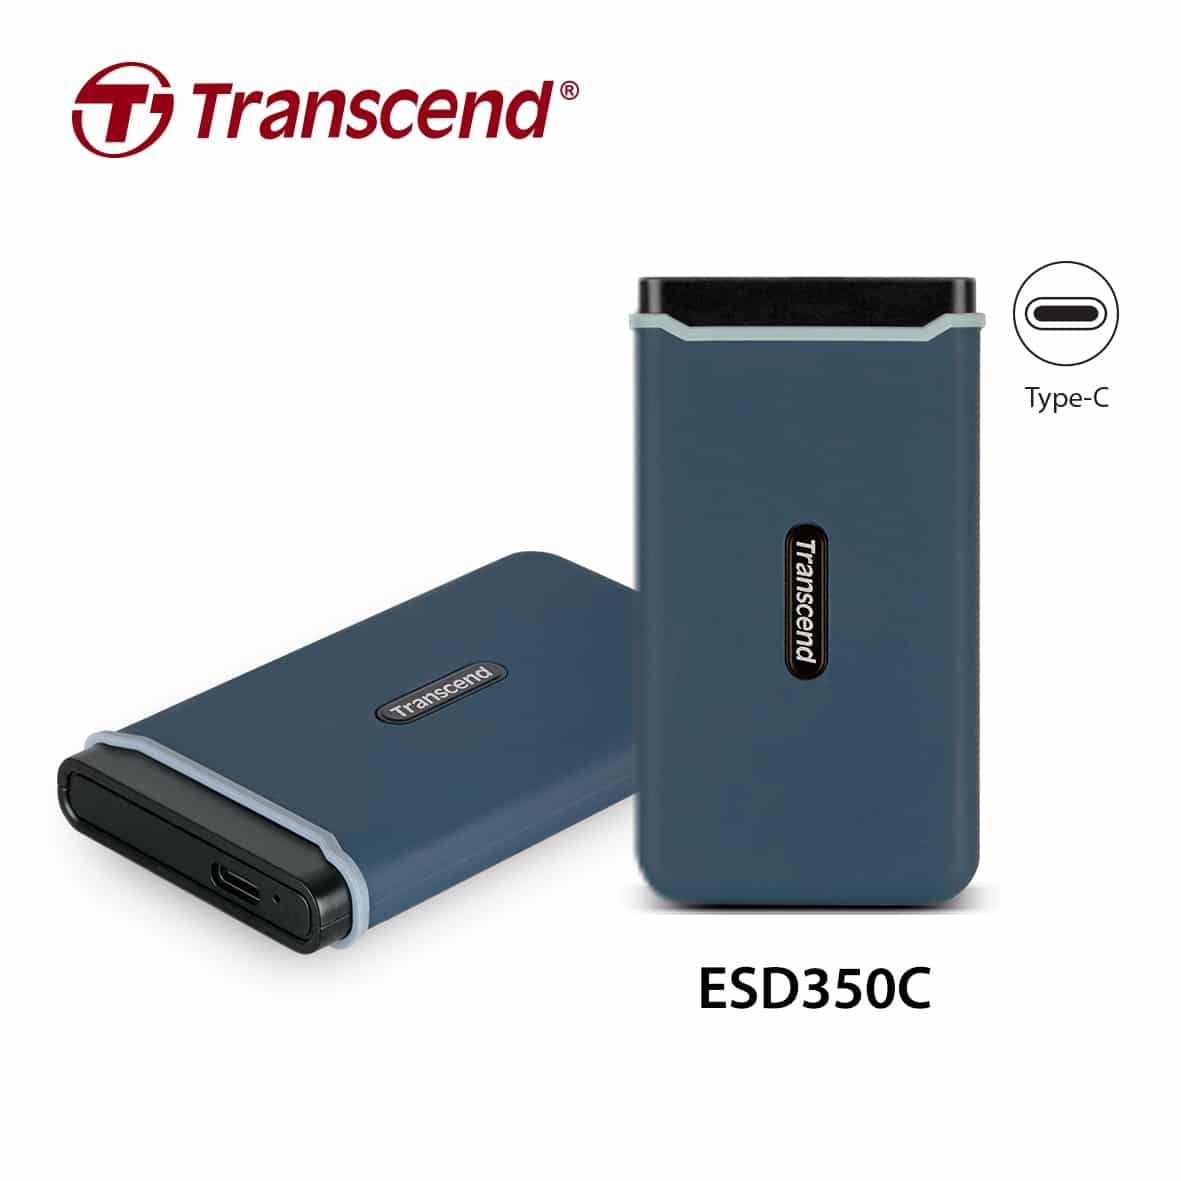 Transcend เปิดตัว SSD แบบพกพารุ่นใหม่ อินเตอร์เฟส USB 3.1 Gen 2 ความจุขนาดใหญ่ ขนาดกะทัดรัด และทนต่อแรงกระแทก - Transcend เปิดตัว SSD แบบพกพารุ่นใหม่ อินเตอร์เฟส USB 3.1 Gen 2 ความจุขนาดใหญ่ ขนาดกะทัดรัด และทนต่อแรงกระแทก